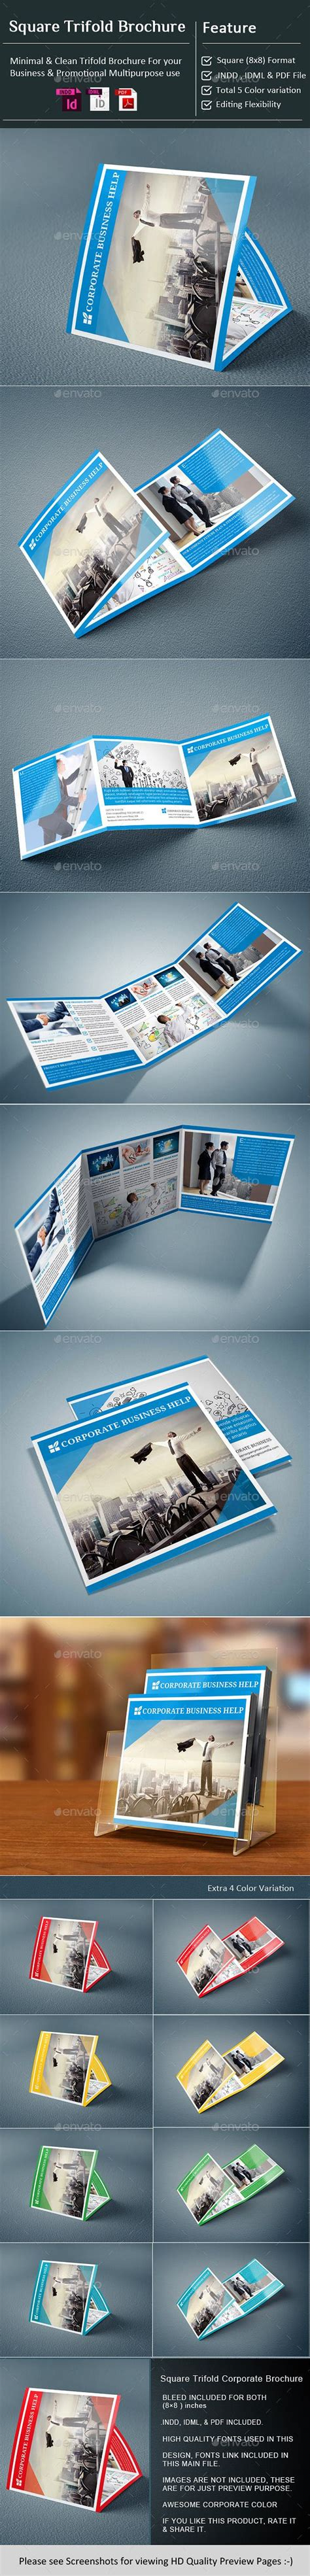 InDesign - Corporate Square Tri-Fold Brochure | Trifold ...